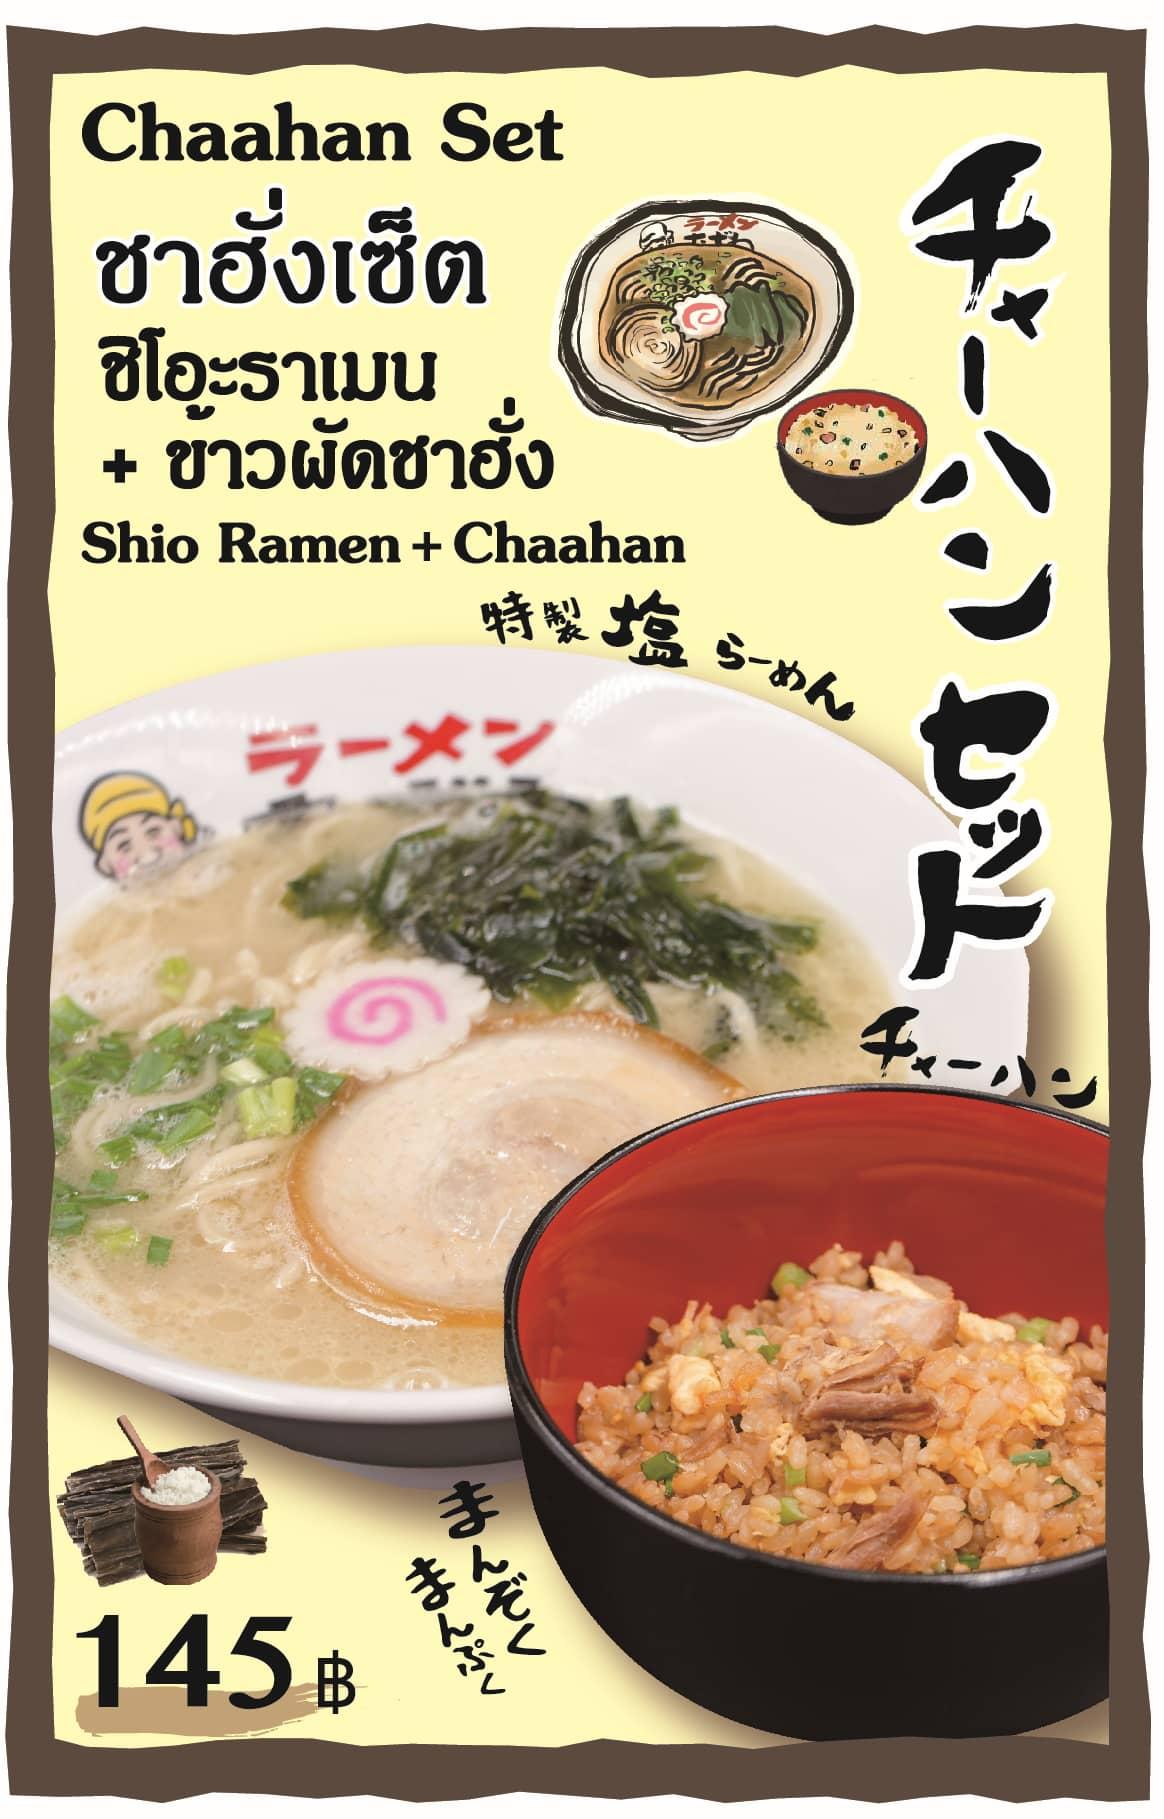 Chaahan Set ชาฮั่งเซ็ต - ชิโอะราเมน + ข้าวผัดชาฮั่ง Shio Ramen + Chaahan